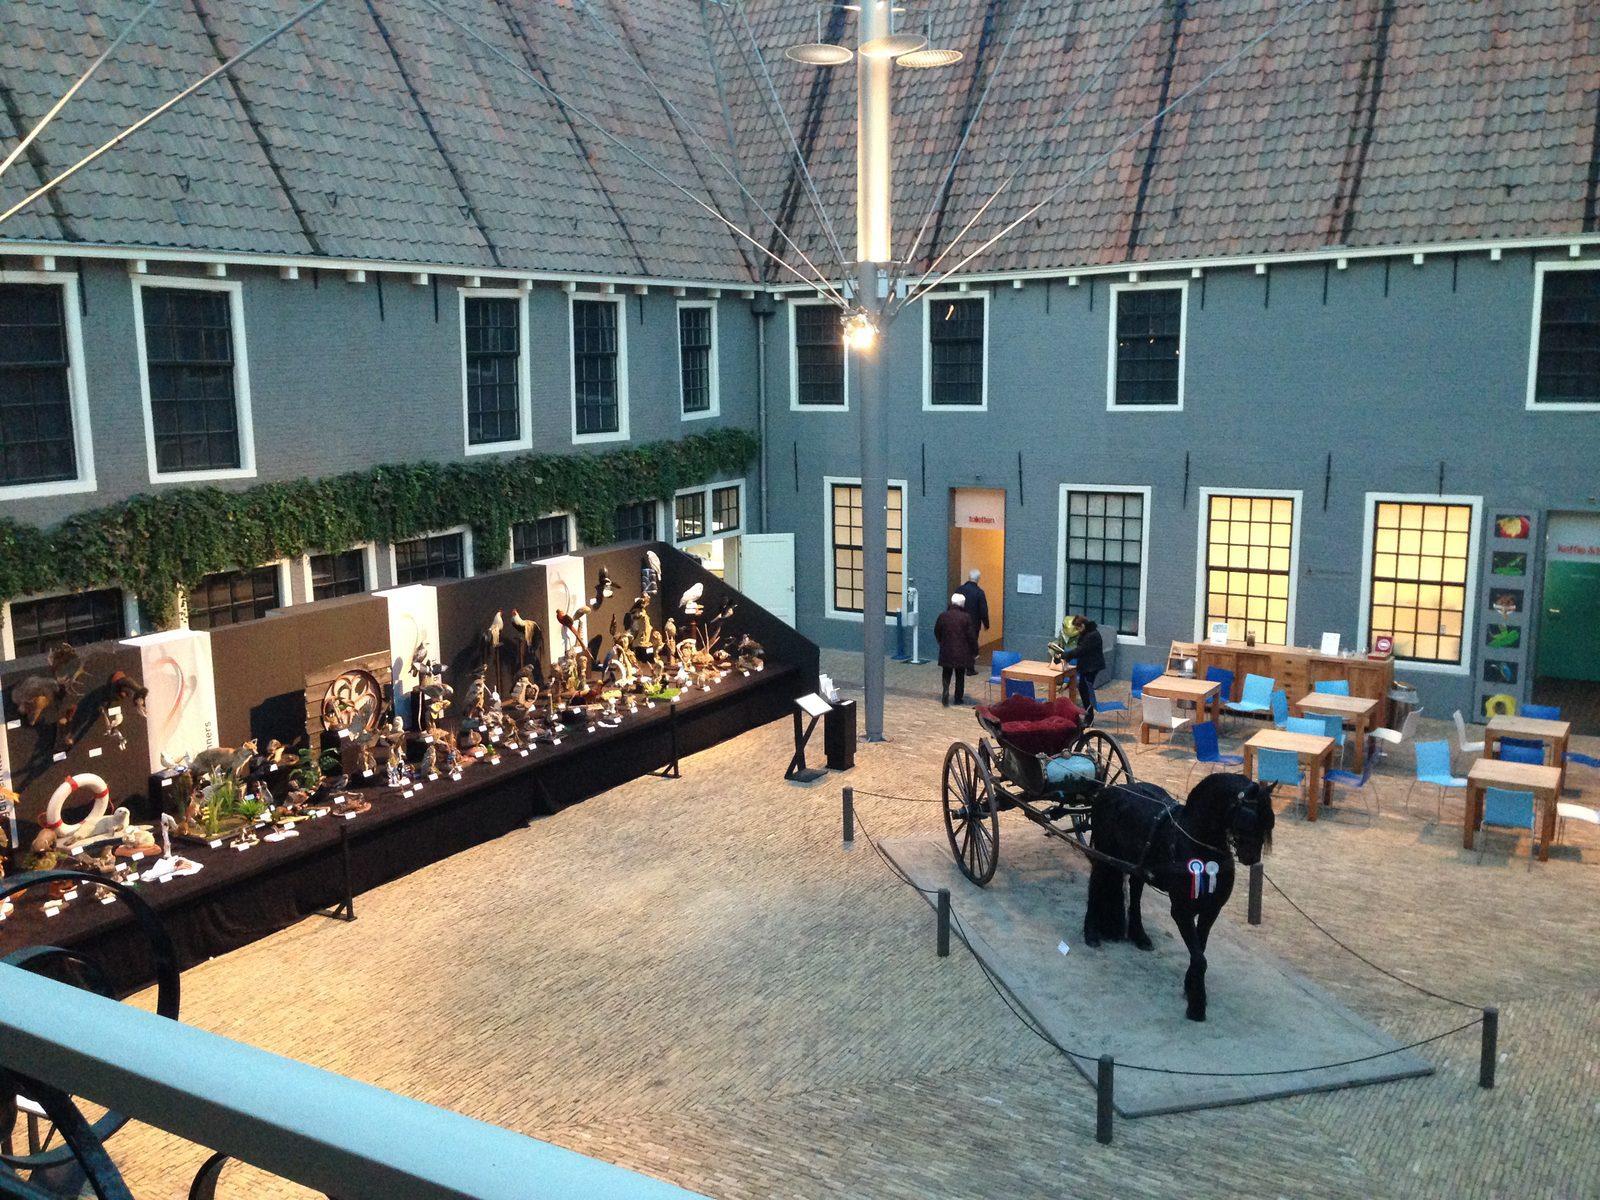 Freisisches Naturmuseum – Leeuwarden